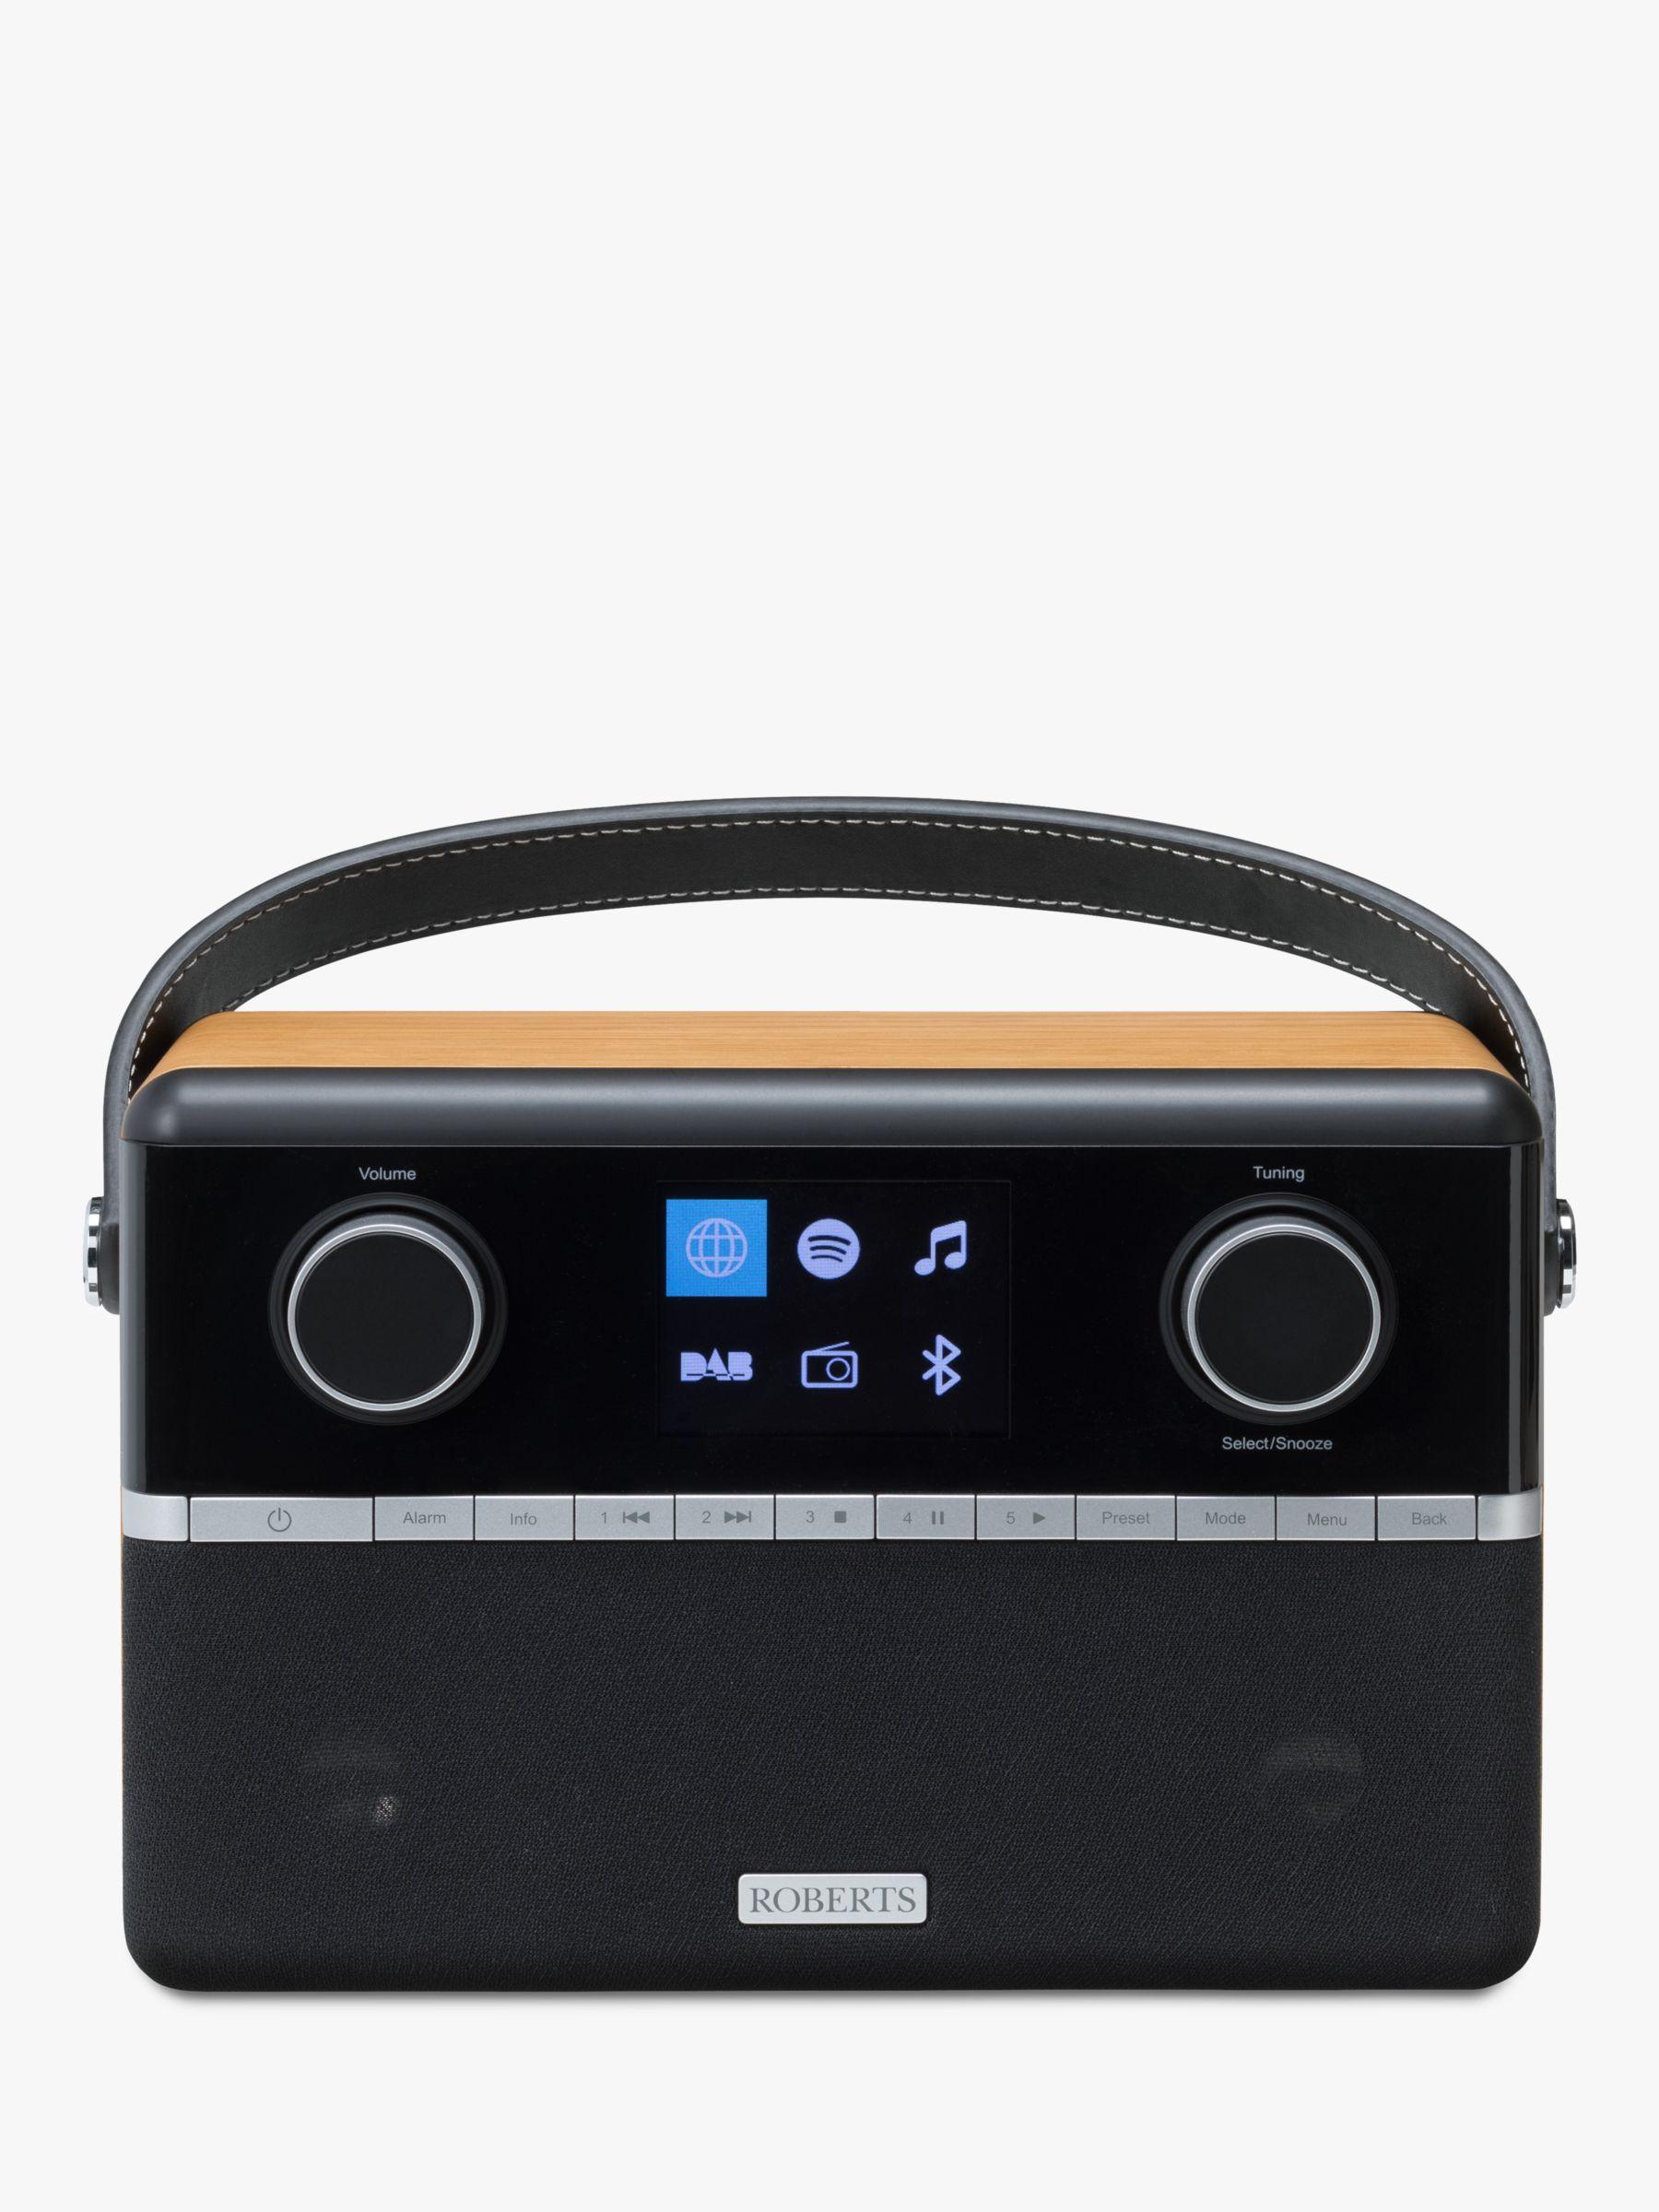 ROBERTS Stream 94i DAB+/FM/Internet Smart Radio with Bluetooth